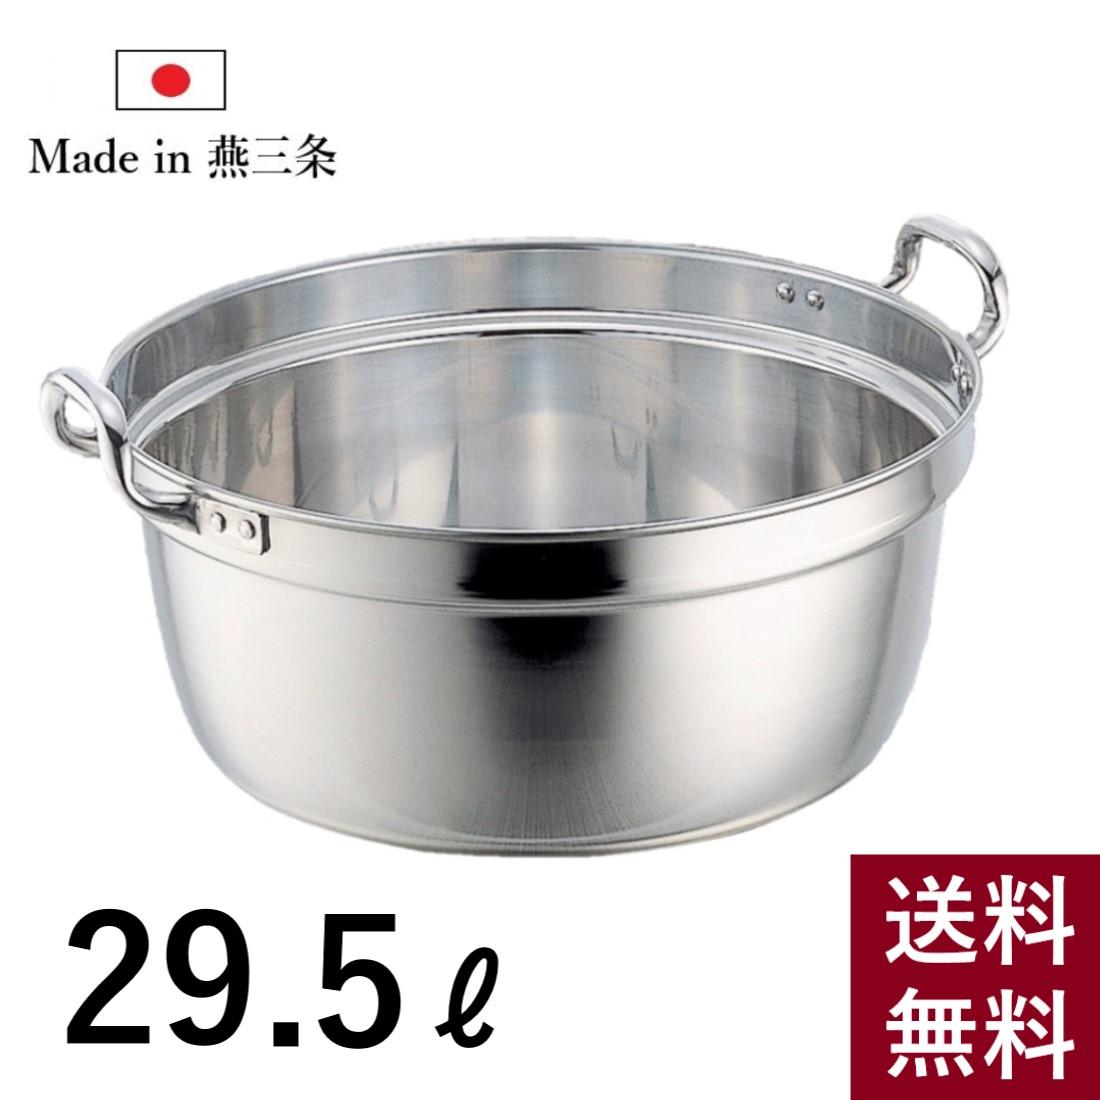 【10%offクーポン配布中!】料理鍋 ステンレス 両手鍋 深型 48cm SW 直火対応 家庭用 業務用 大容量 29.5L 鍋 大きい